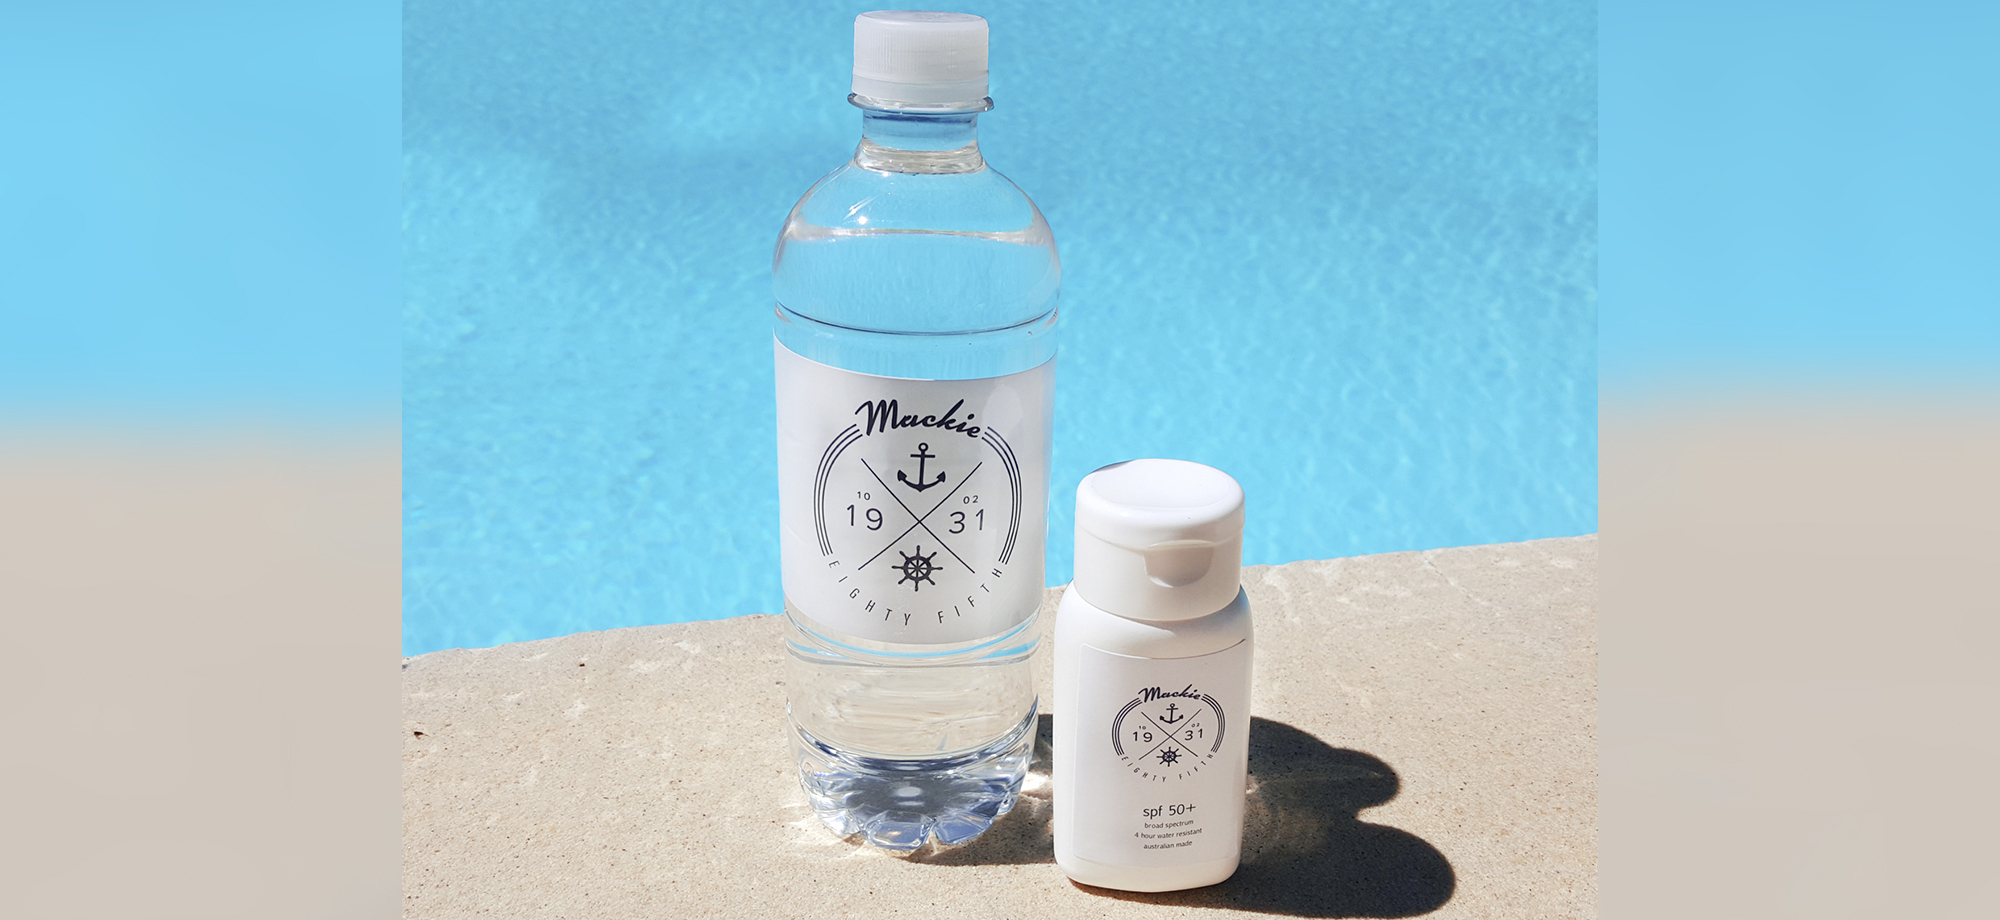 MM85 water and cream banner.jpg